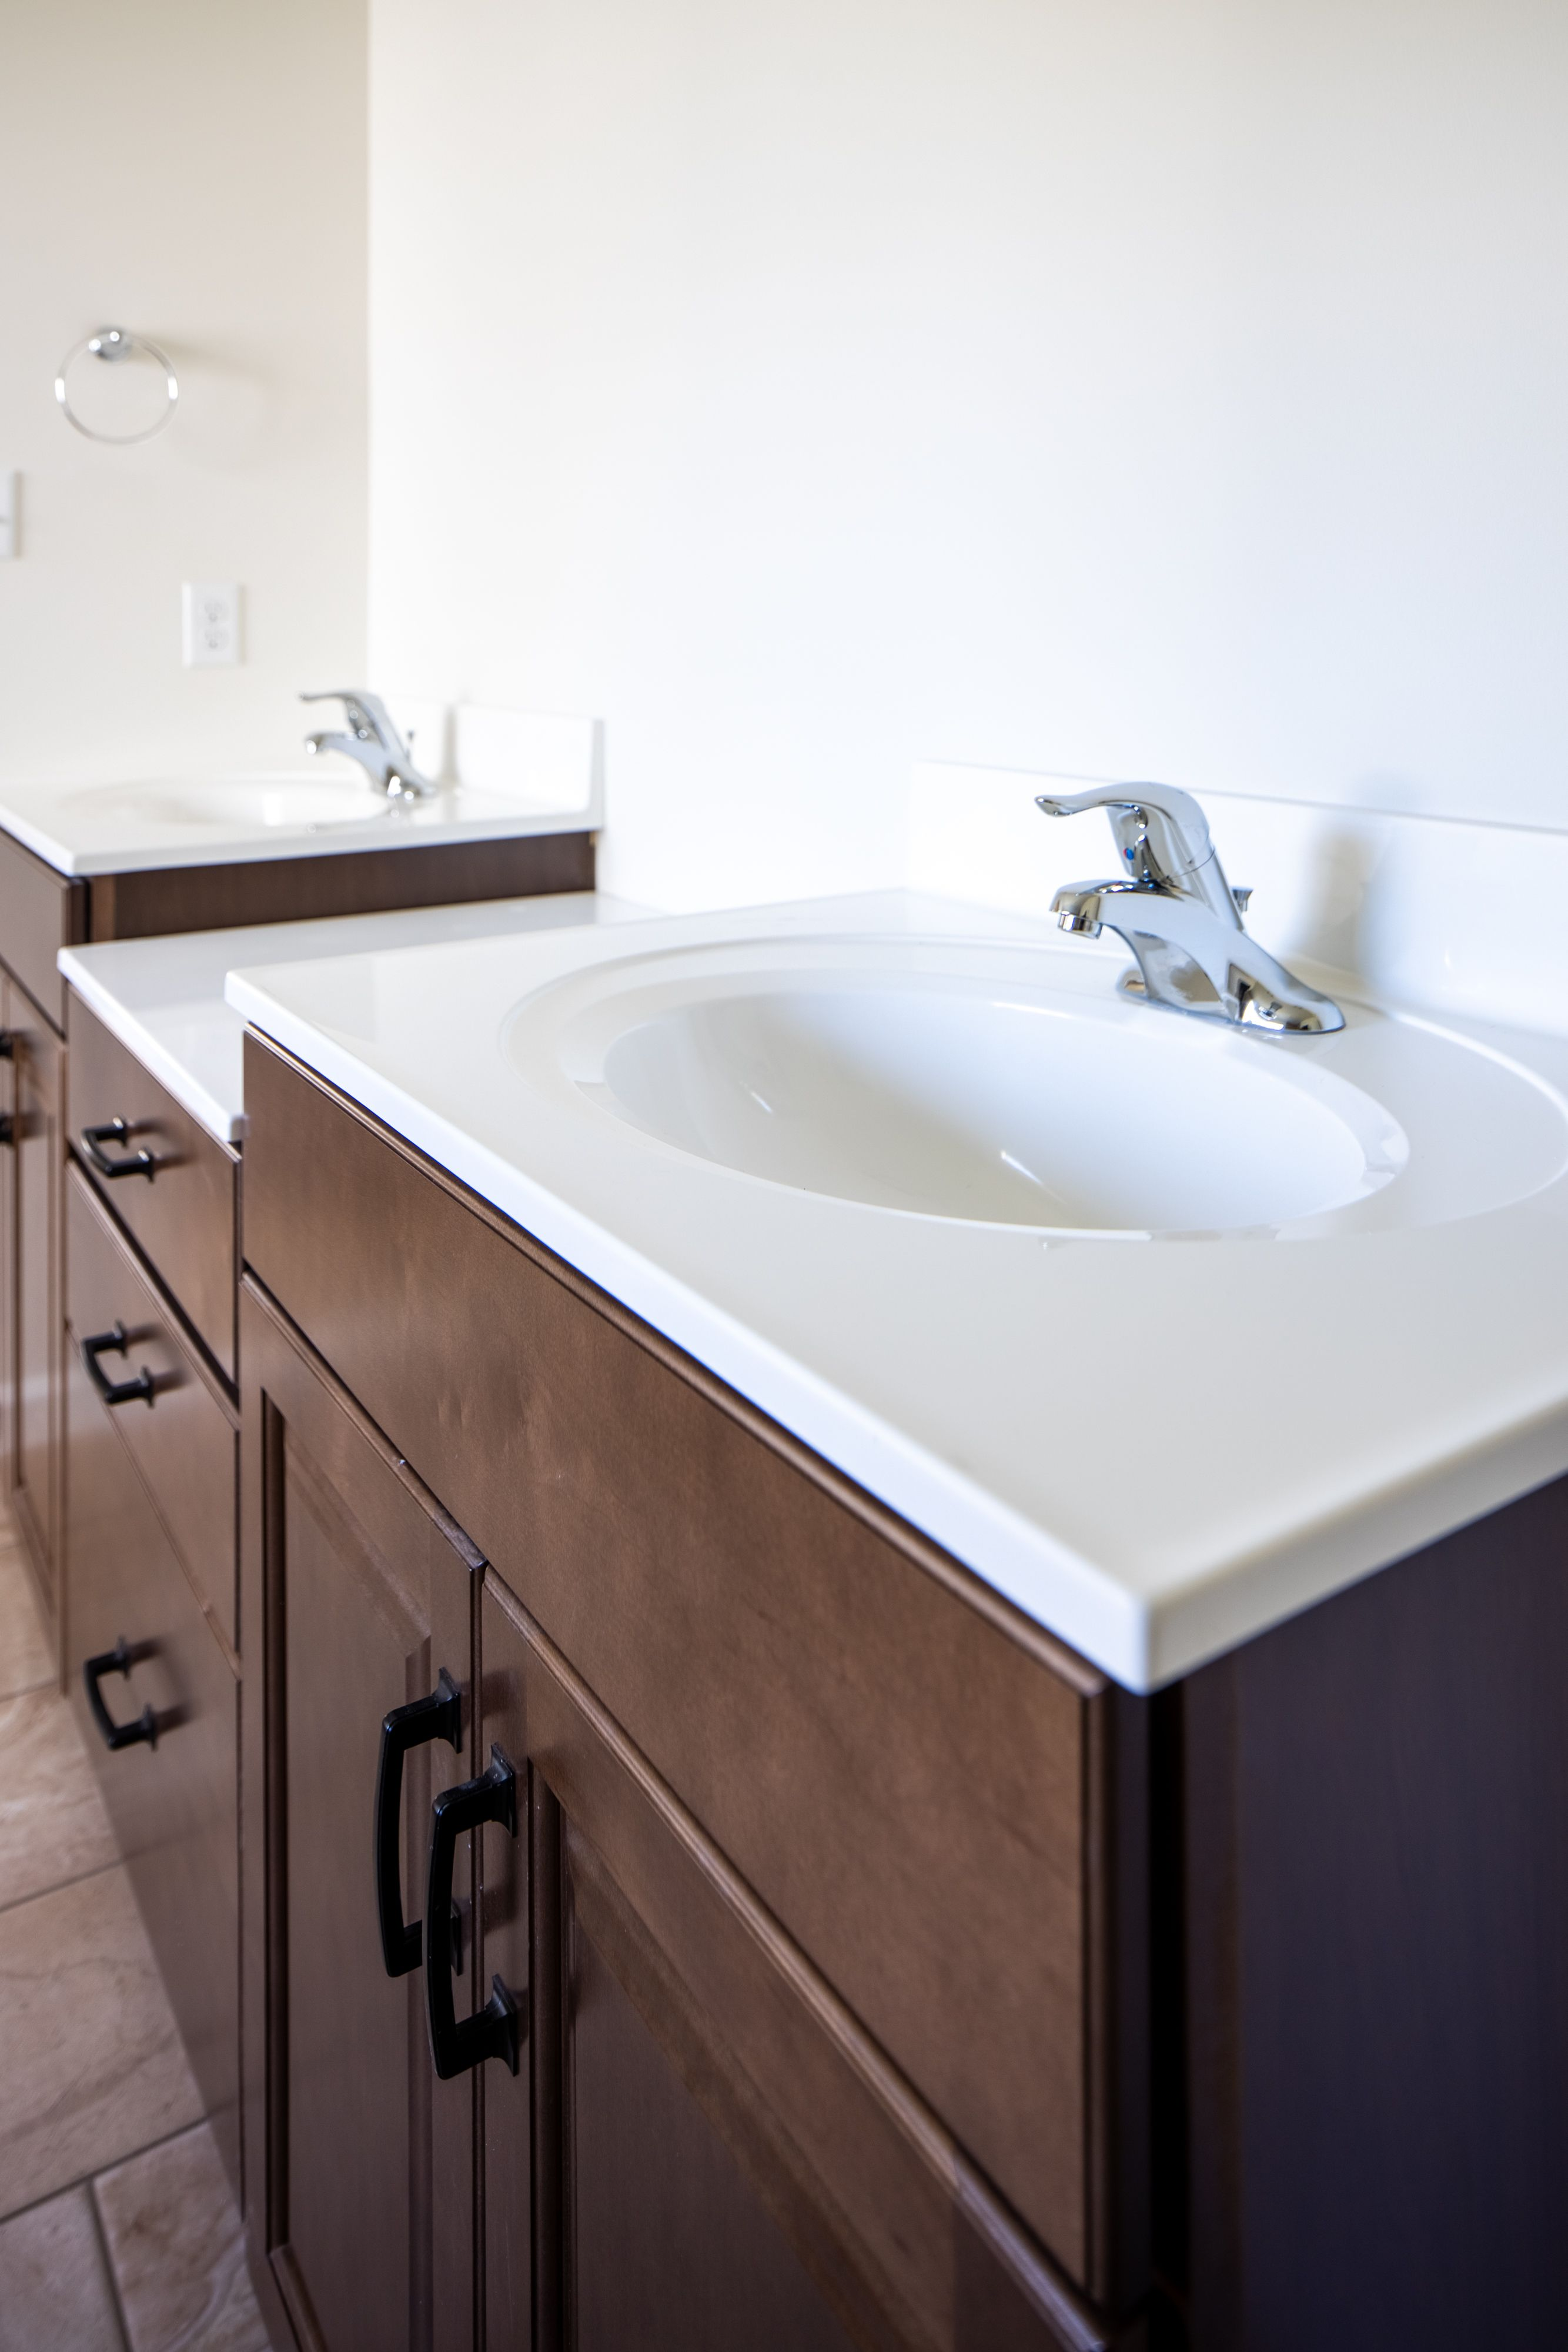 Bathroom featured in the Augusta Bordeaux By Keystone Custom Homes in Harrisburg, PA